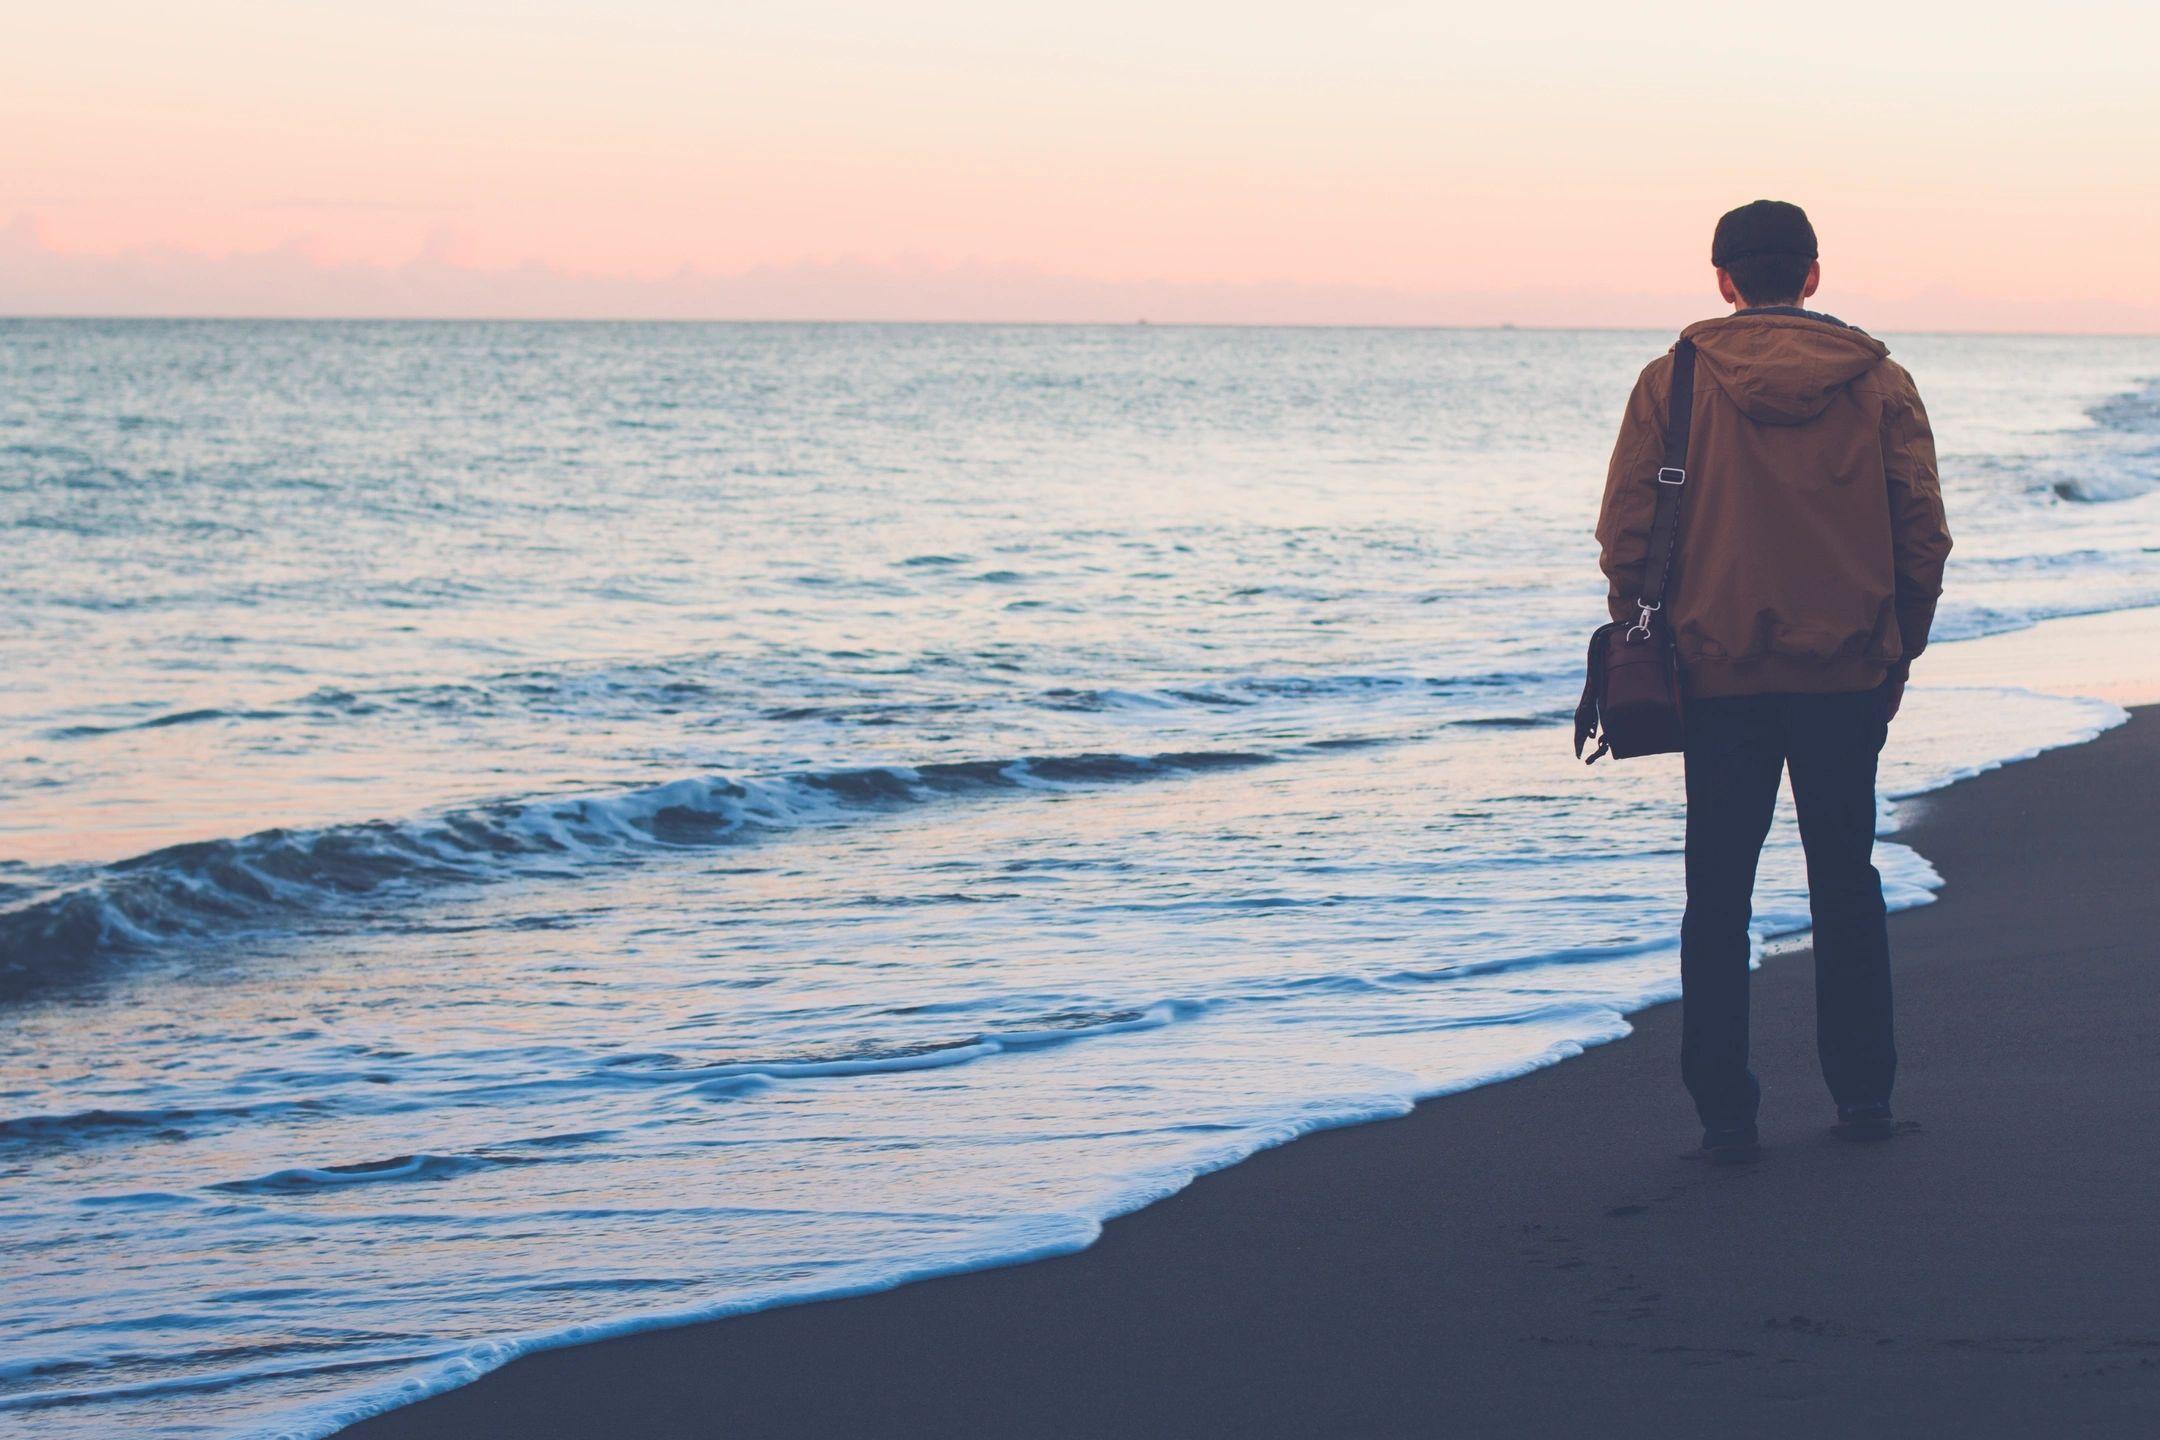 Walk more, live longer - simple!